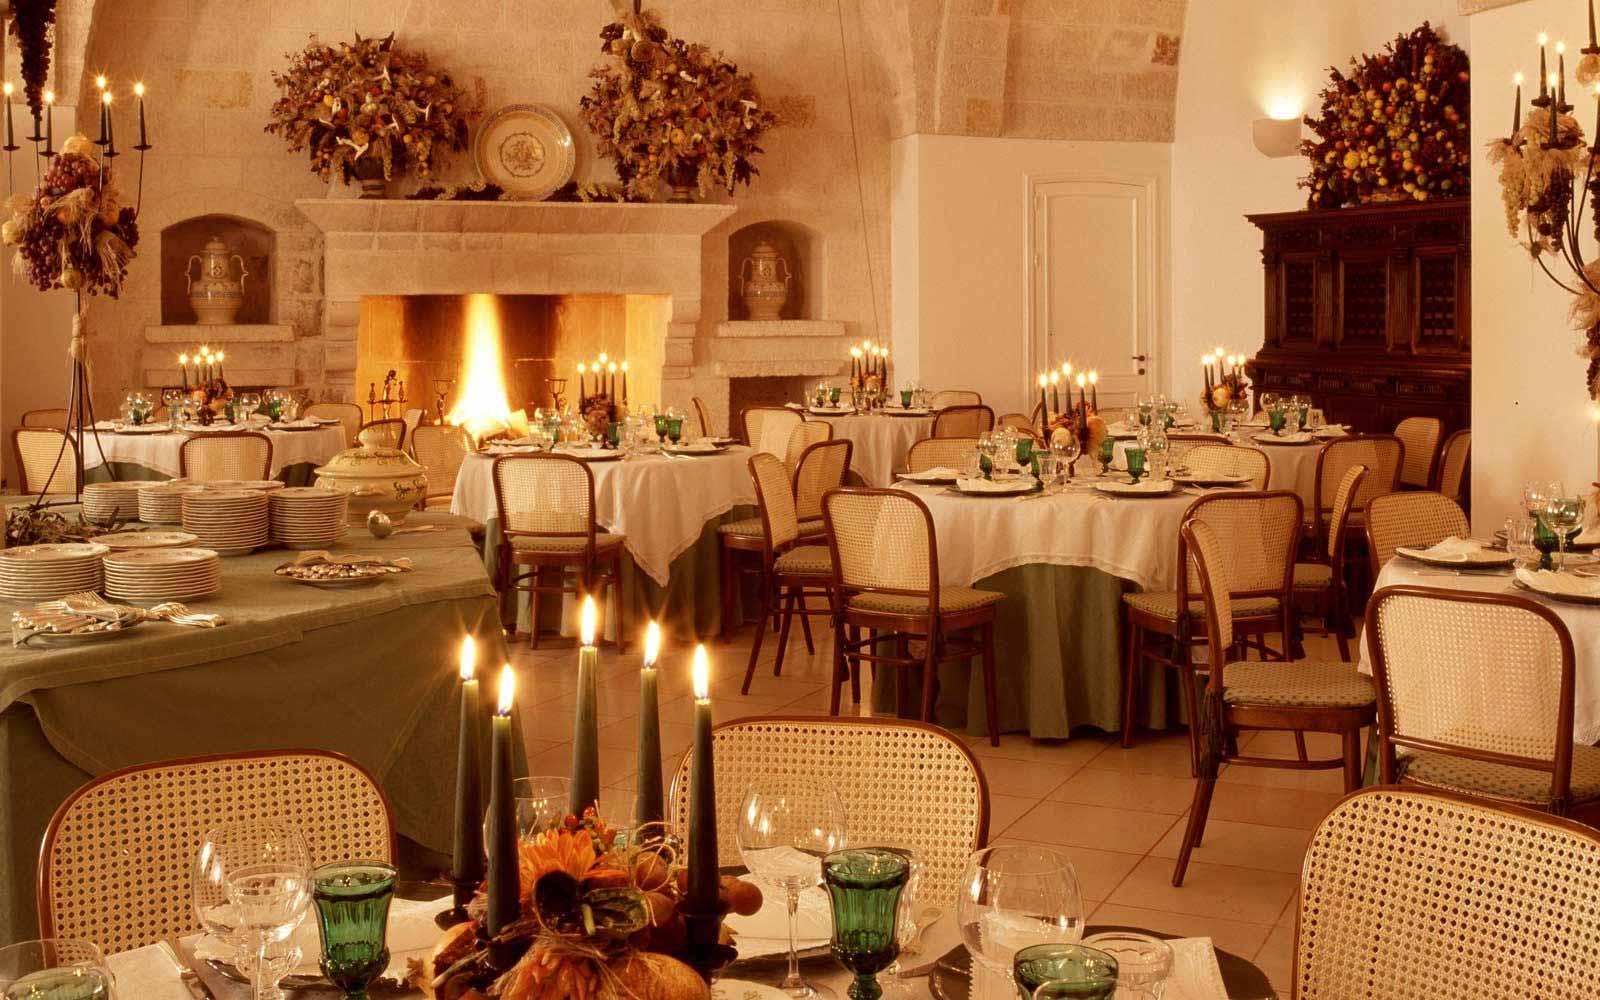 San Domenico restaurant at Masseria San Domenico